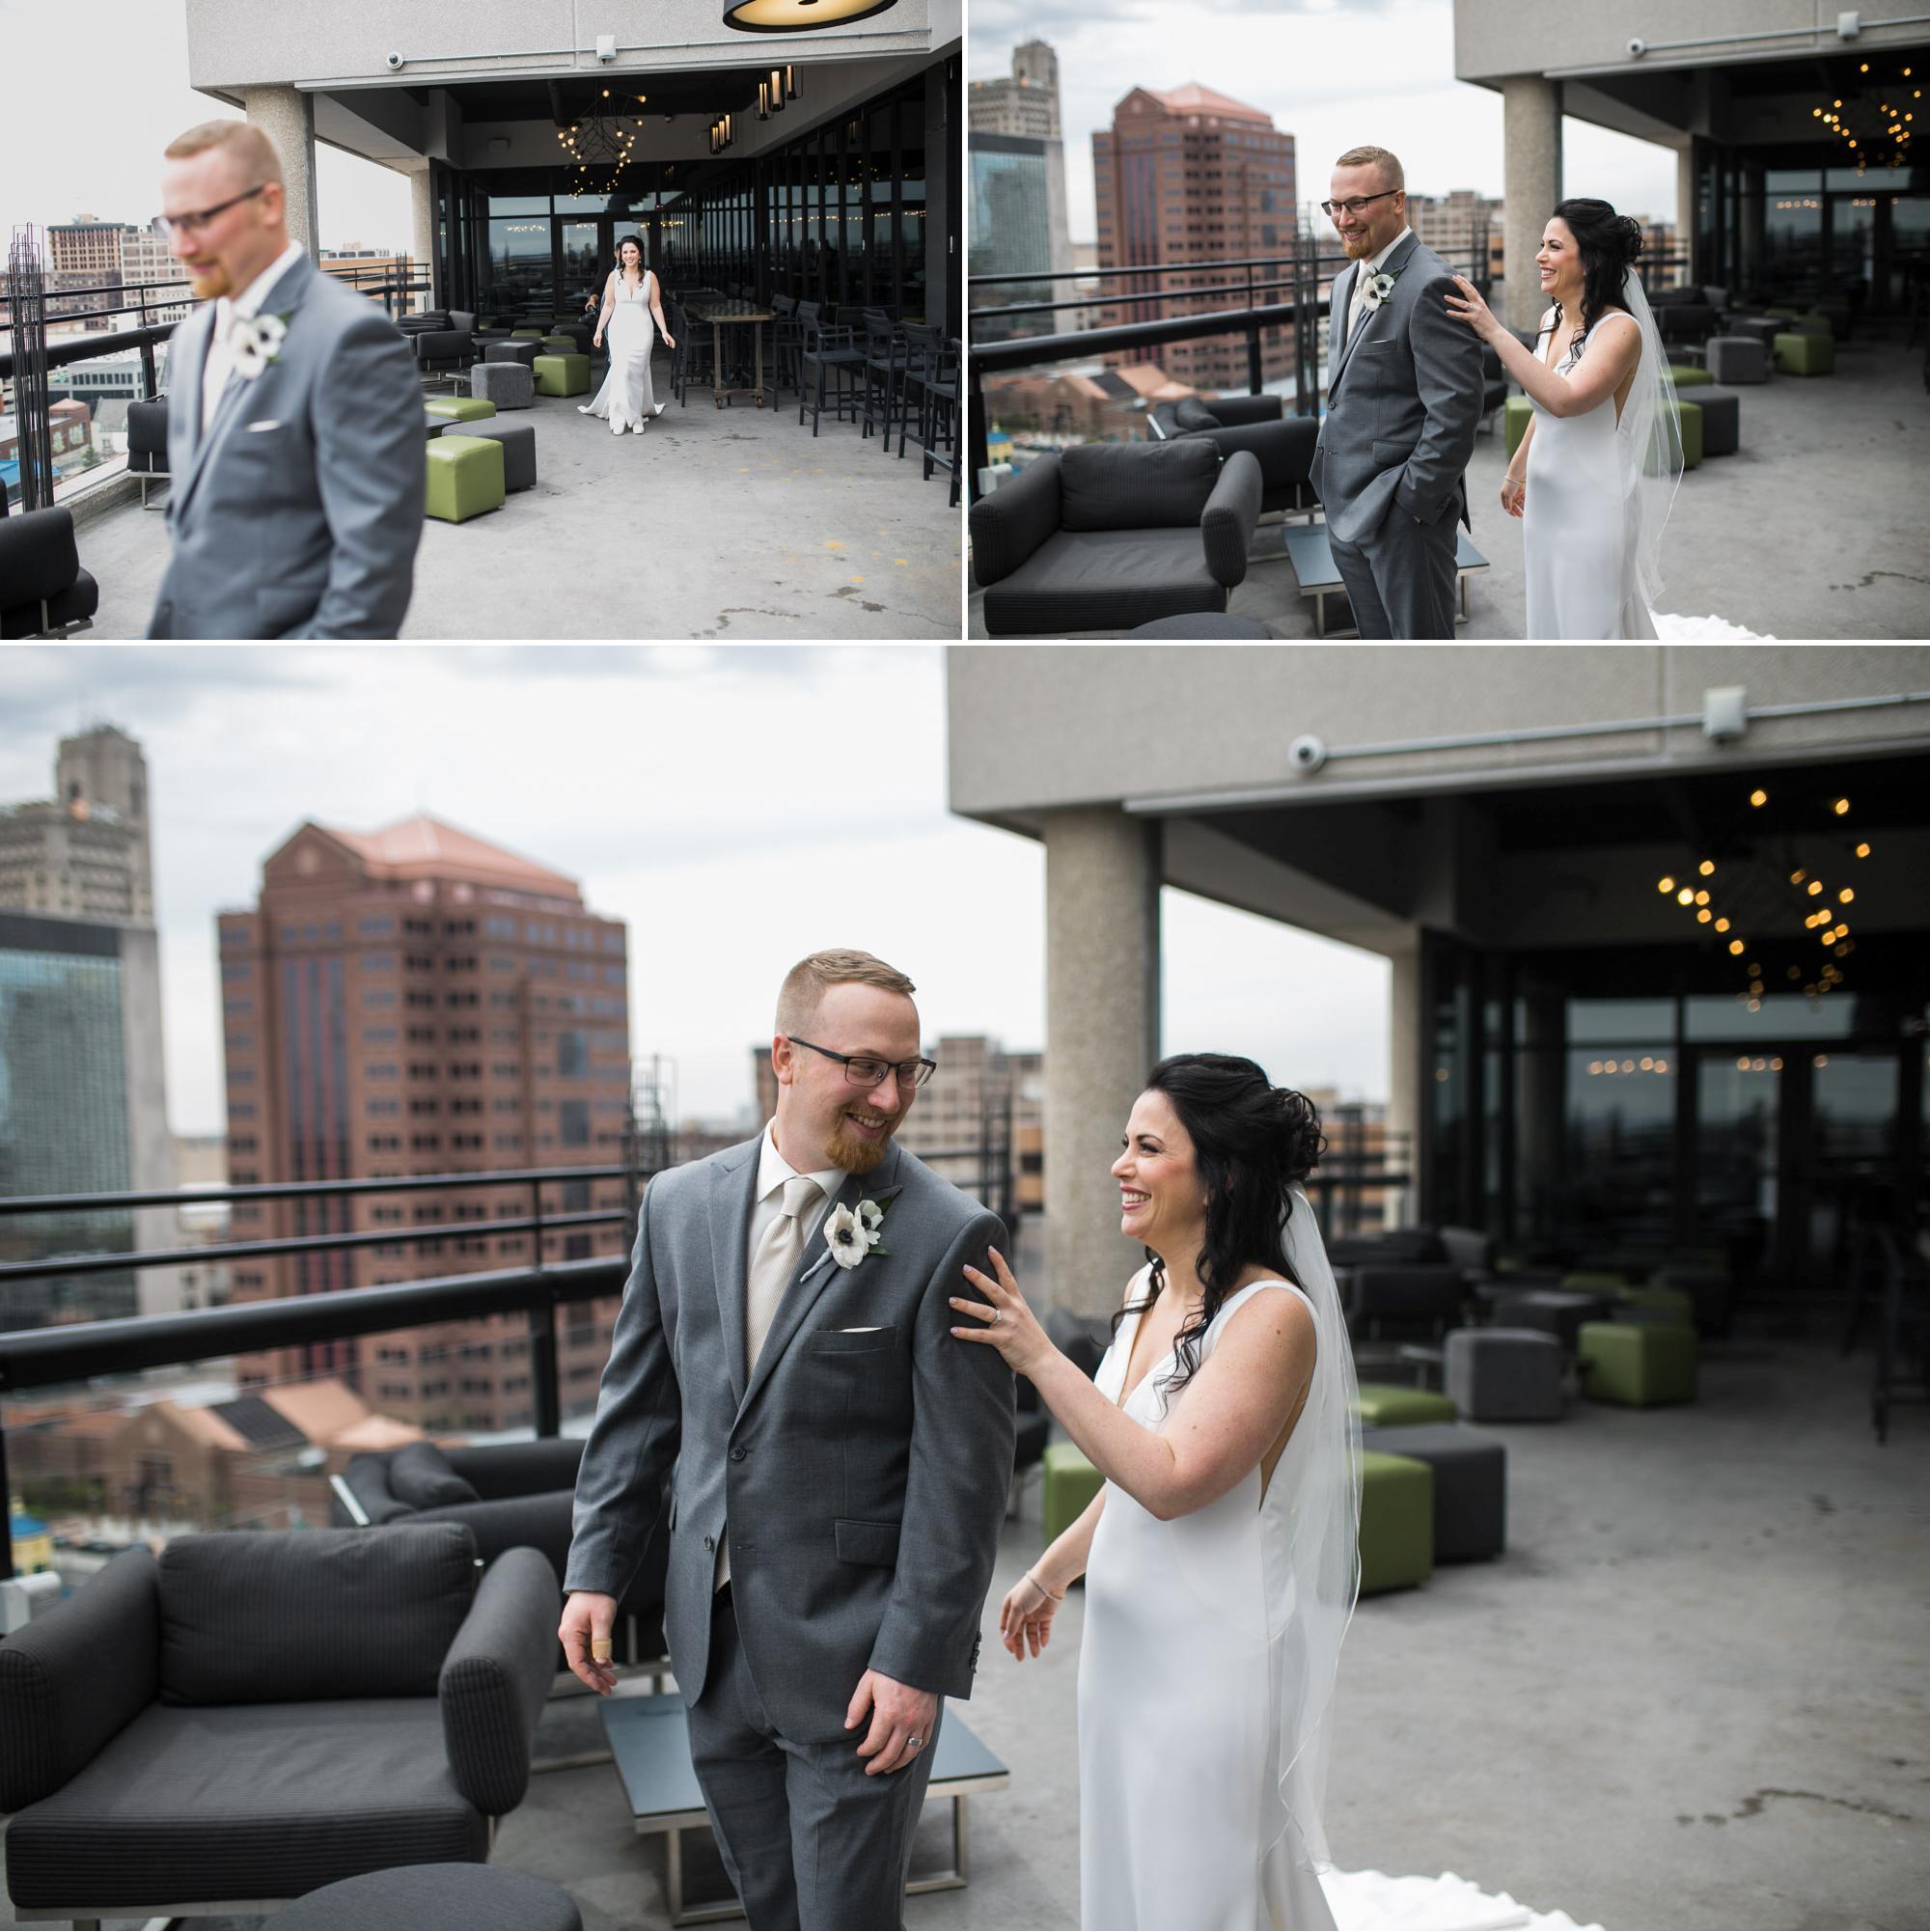 renaissance-hotel-toledo-wedding-163.jpg